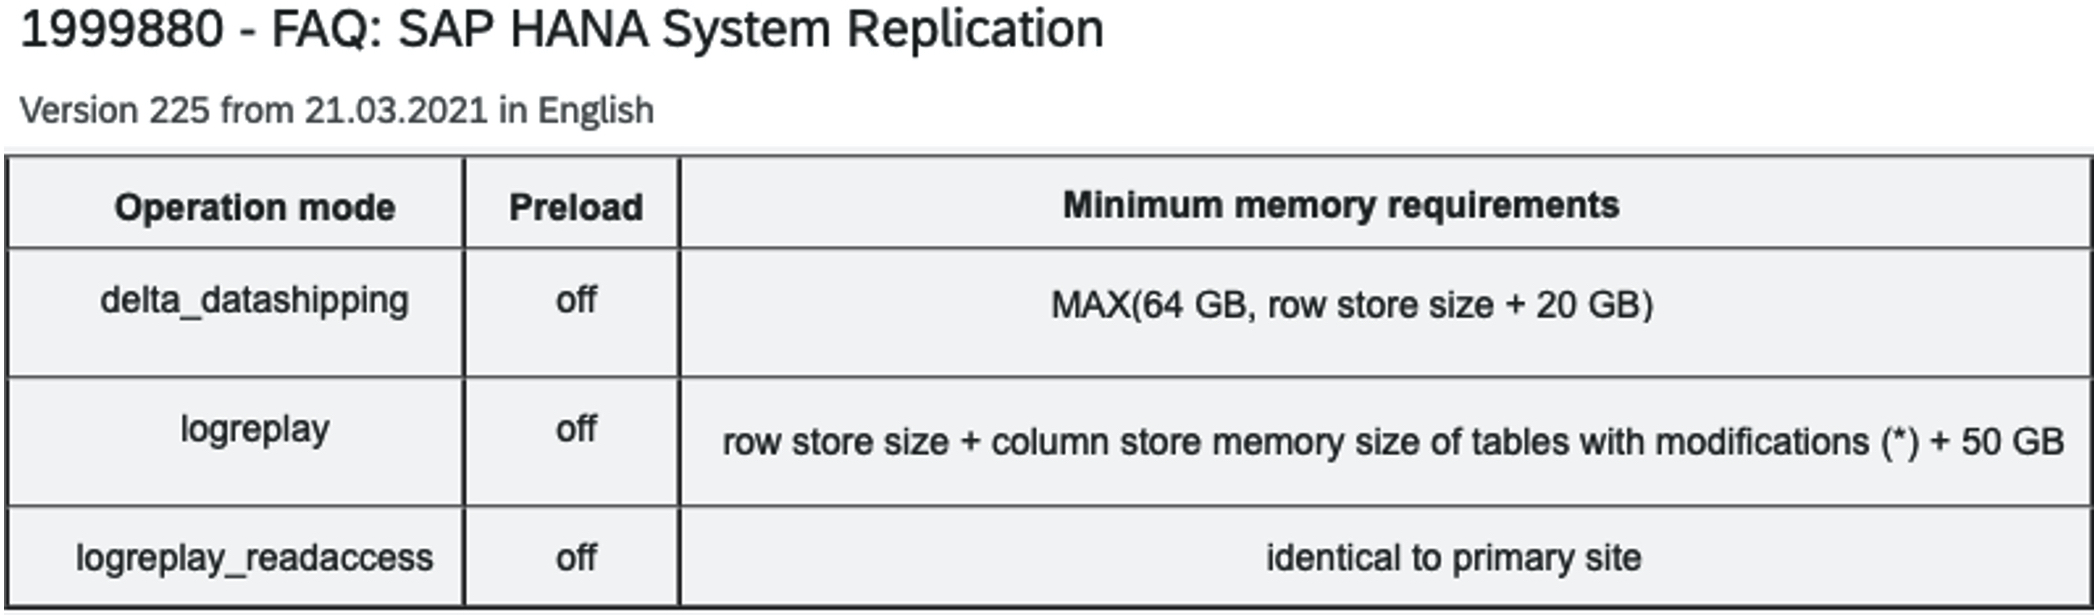 SAP Note 1999880 - FAQ: SAP HANA System Replication